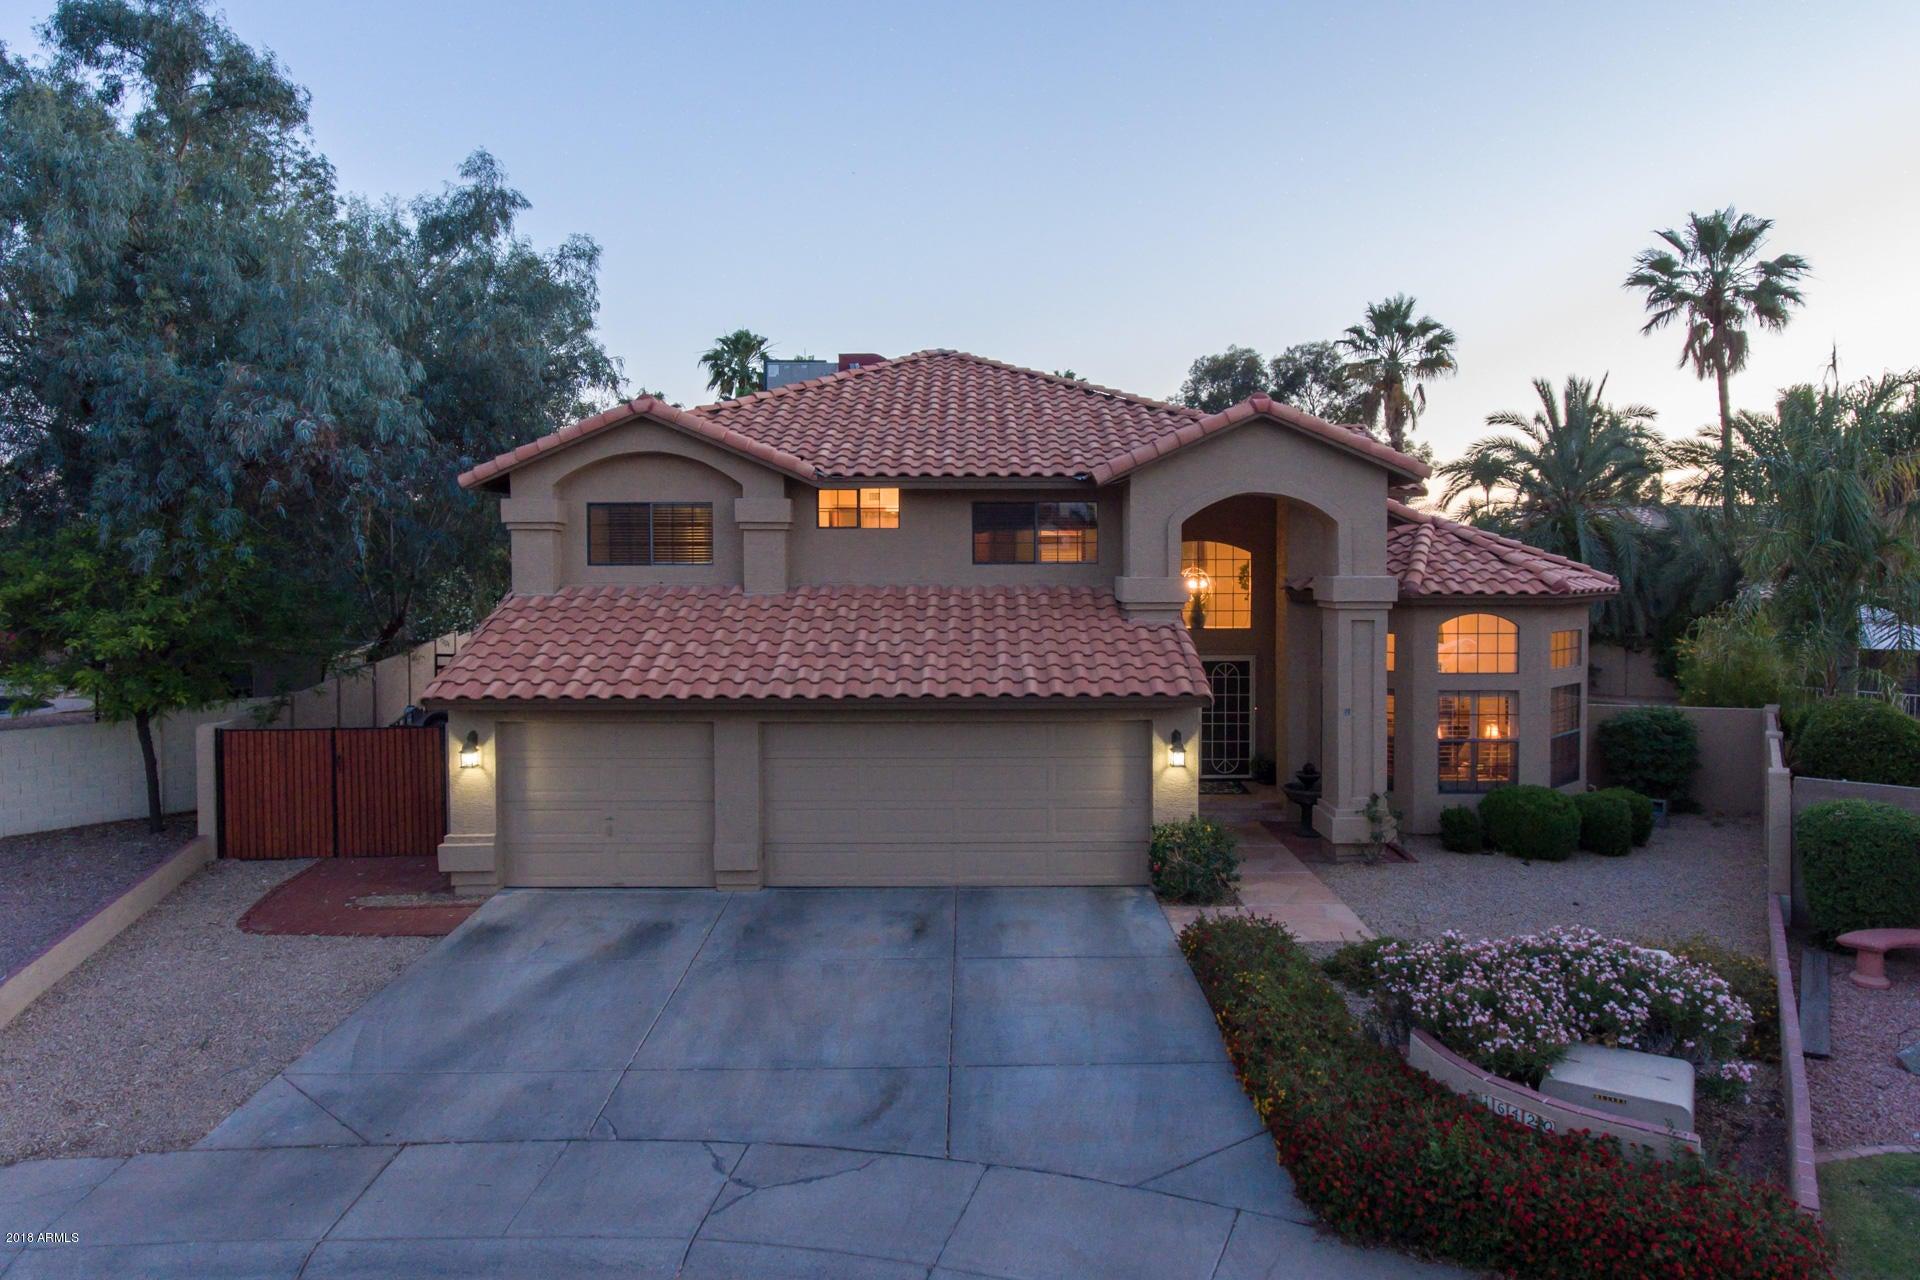 16420 N 51ST Street Scottsdale, AZ 85254 - MLS #: 5766838